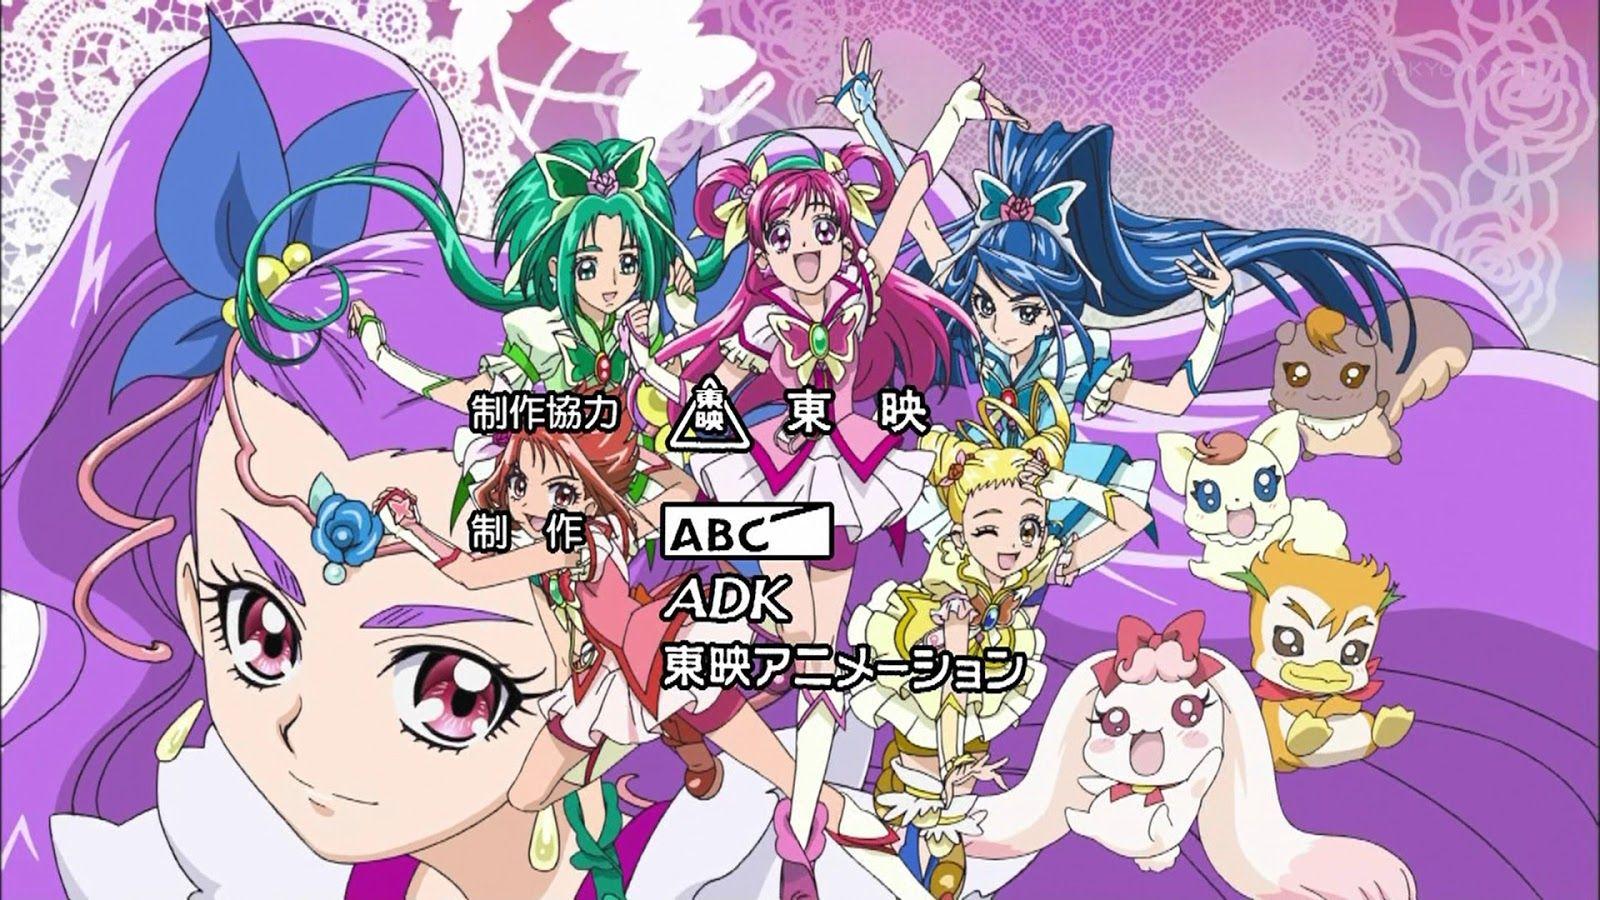 hibiki motto ne on twitter in 2021 pretty cure anime sailor moon crystal